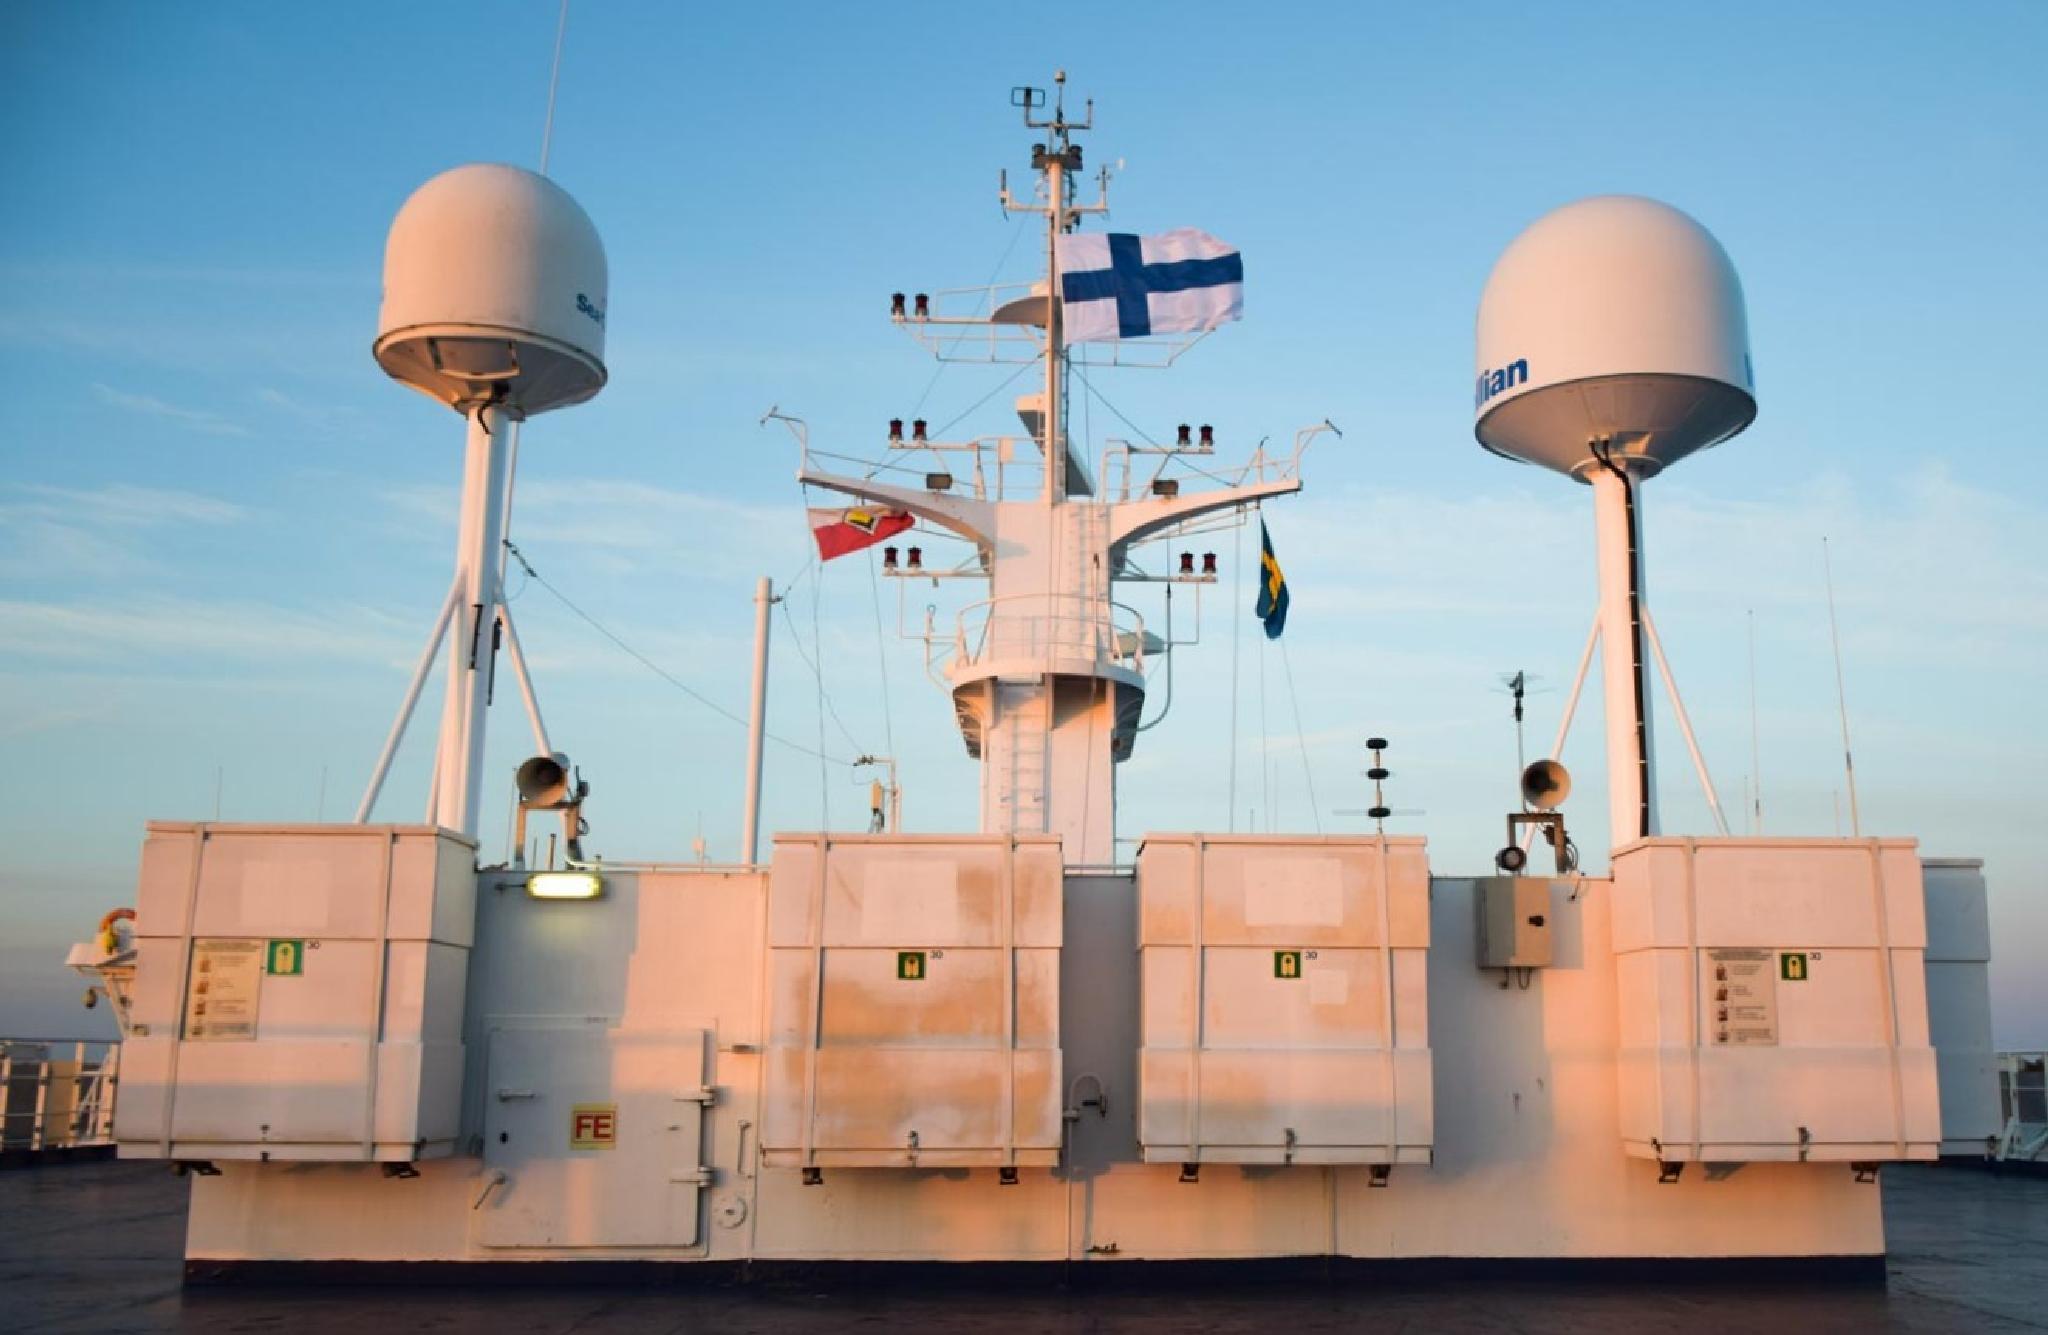 Radars on Boat Deck  by aronrielle